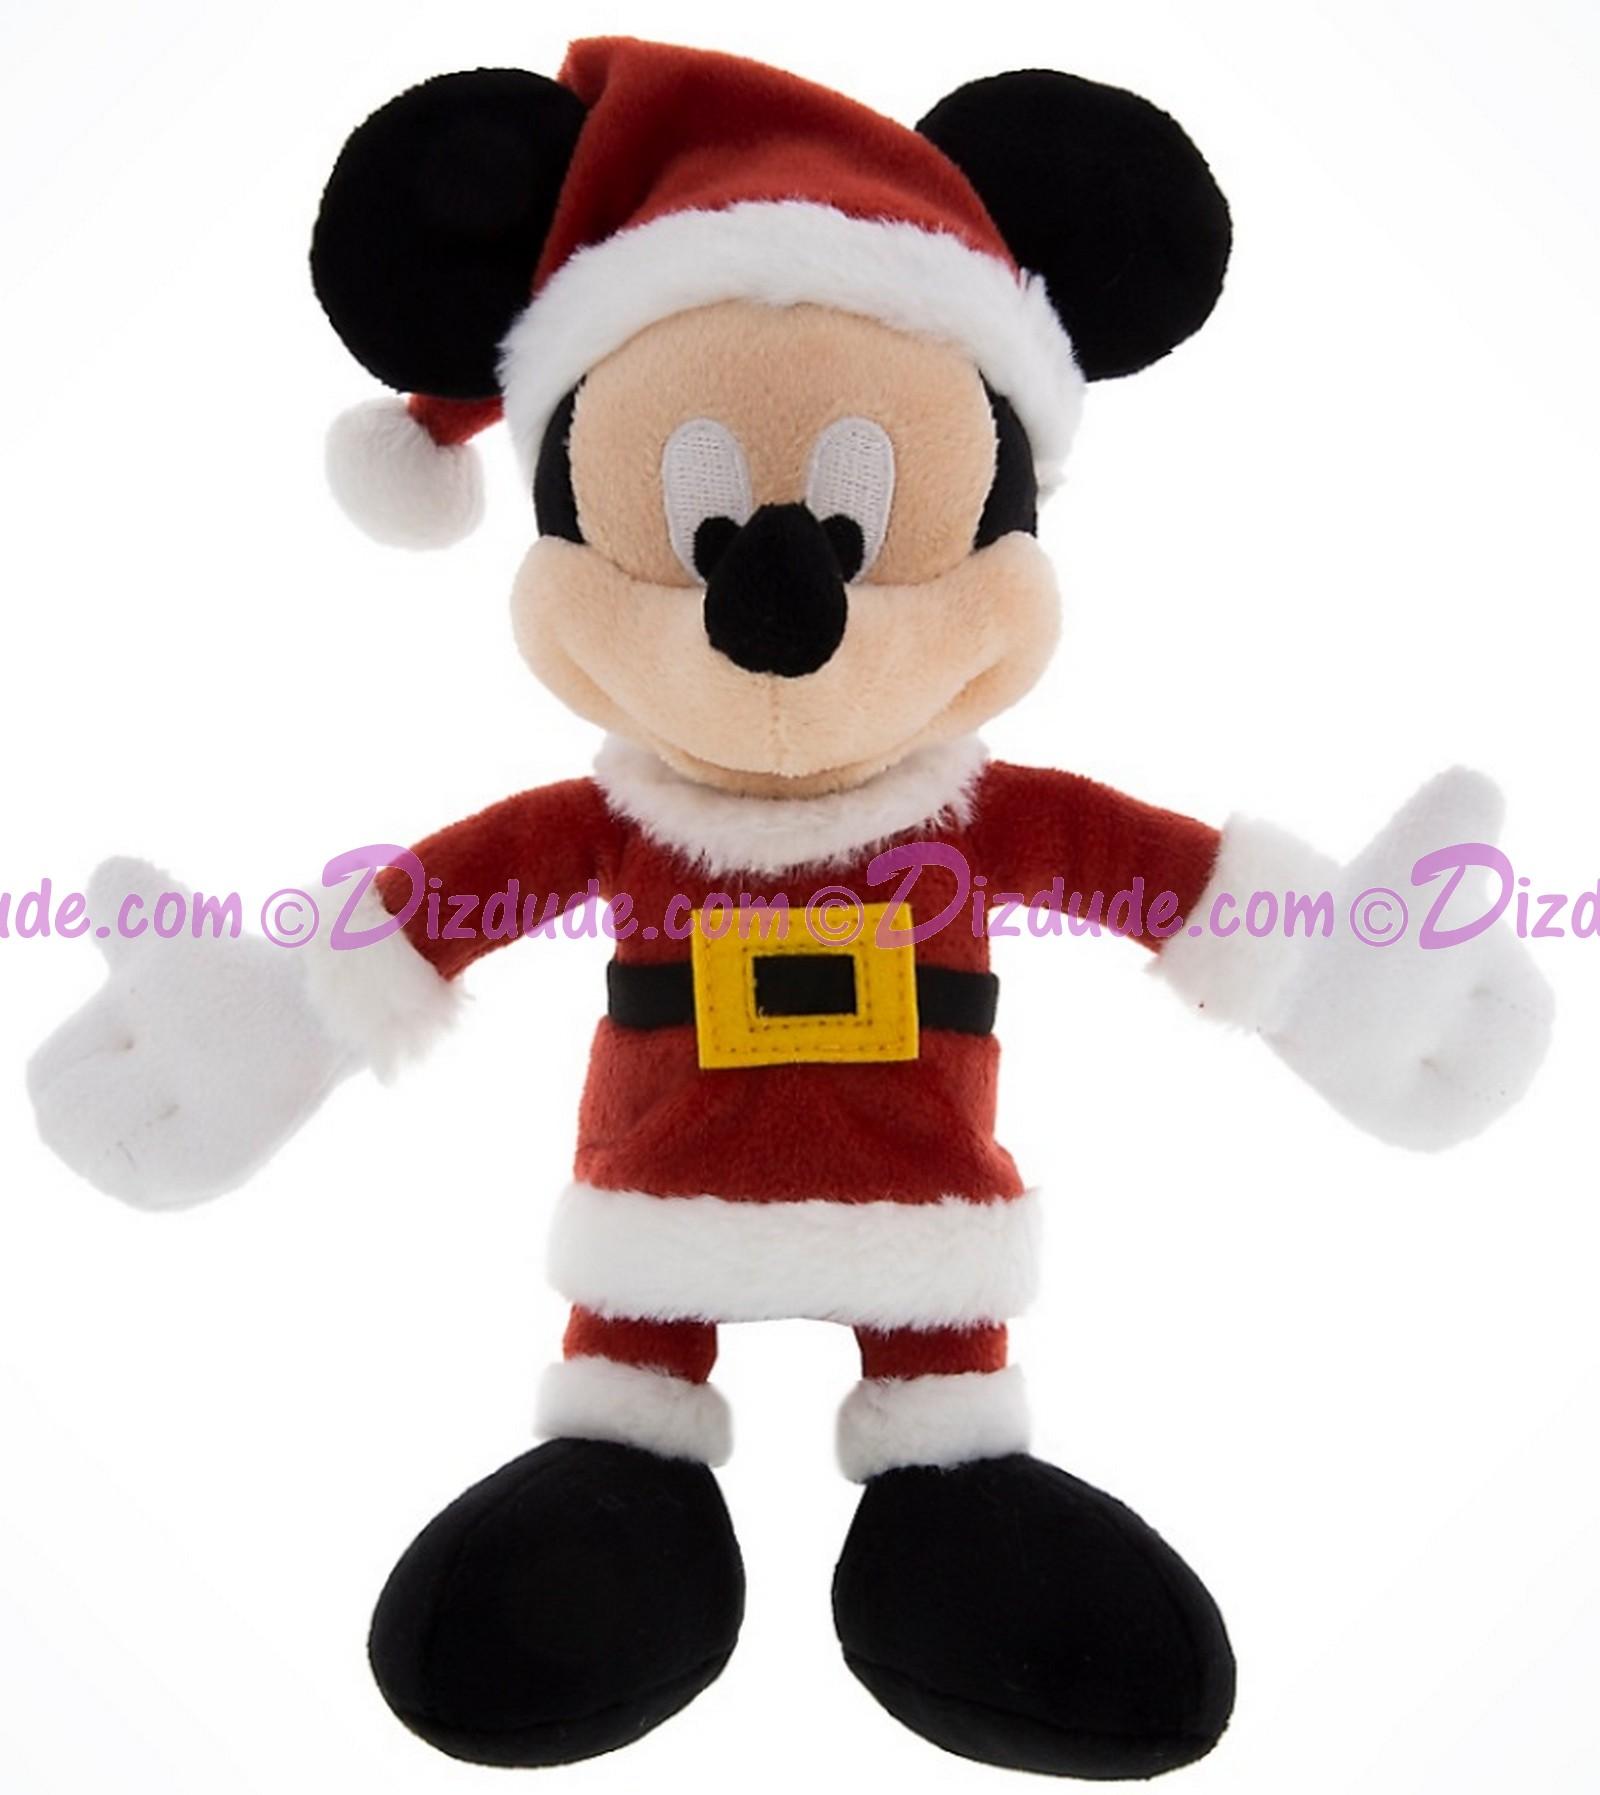 Disney Santa Mickey Mouse 7 inch Plush © Dizdude.com